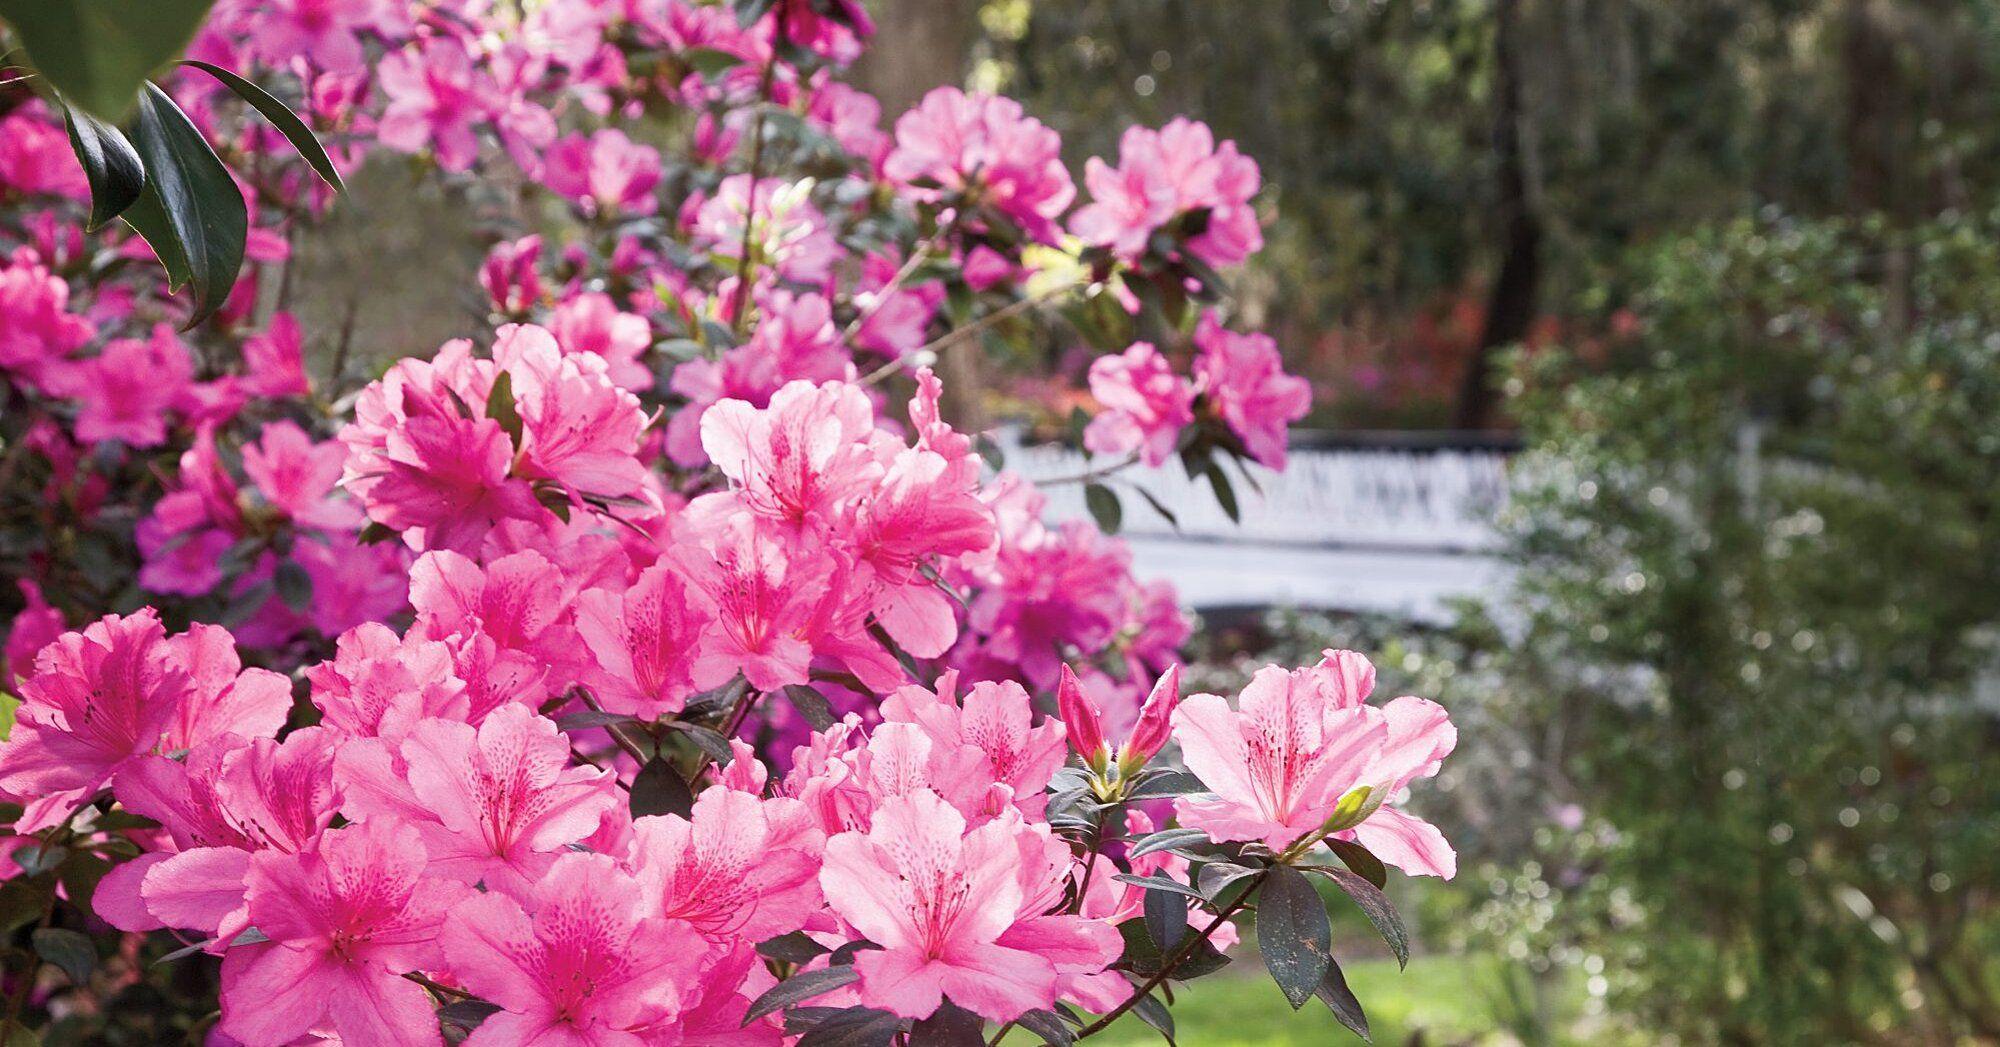 Azalea Planting Guide In 2020 Azaleas Landscaping Azaleas Garden Azaleas Care